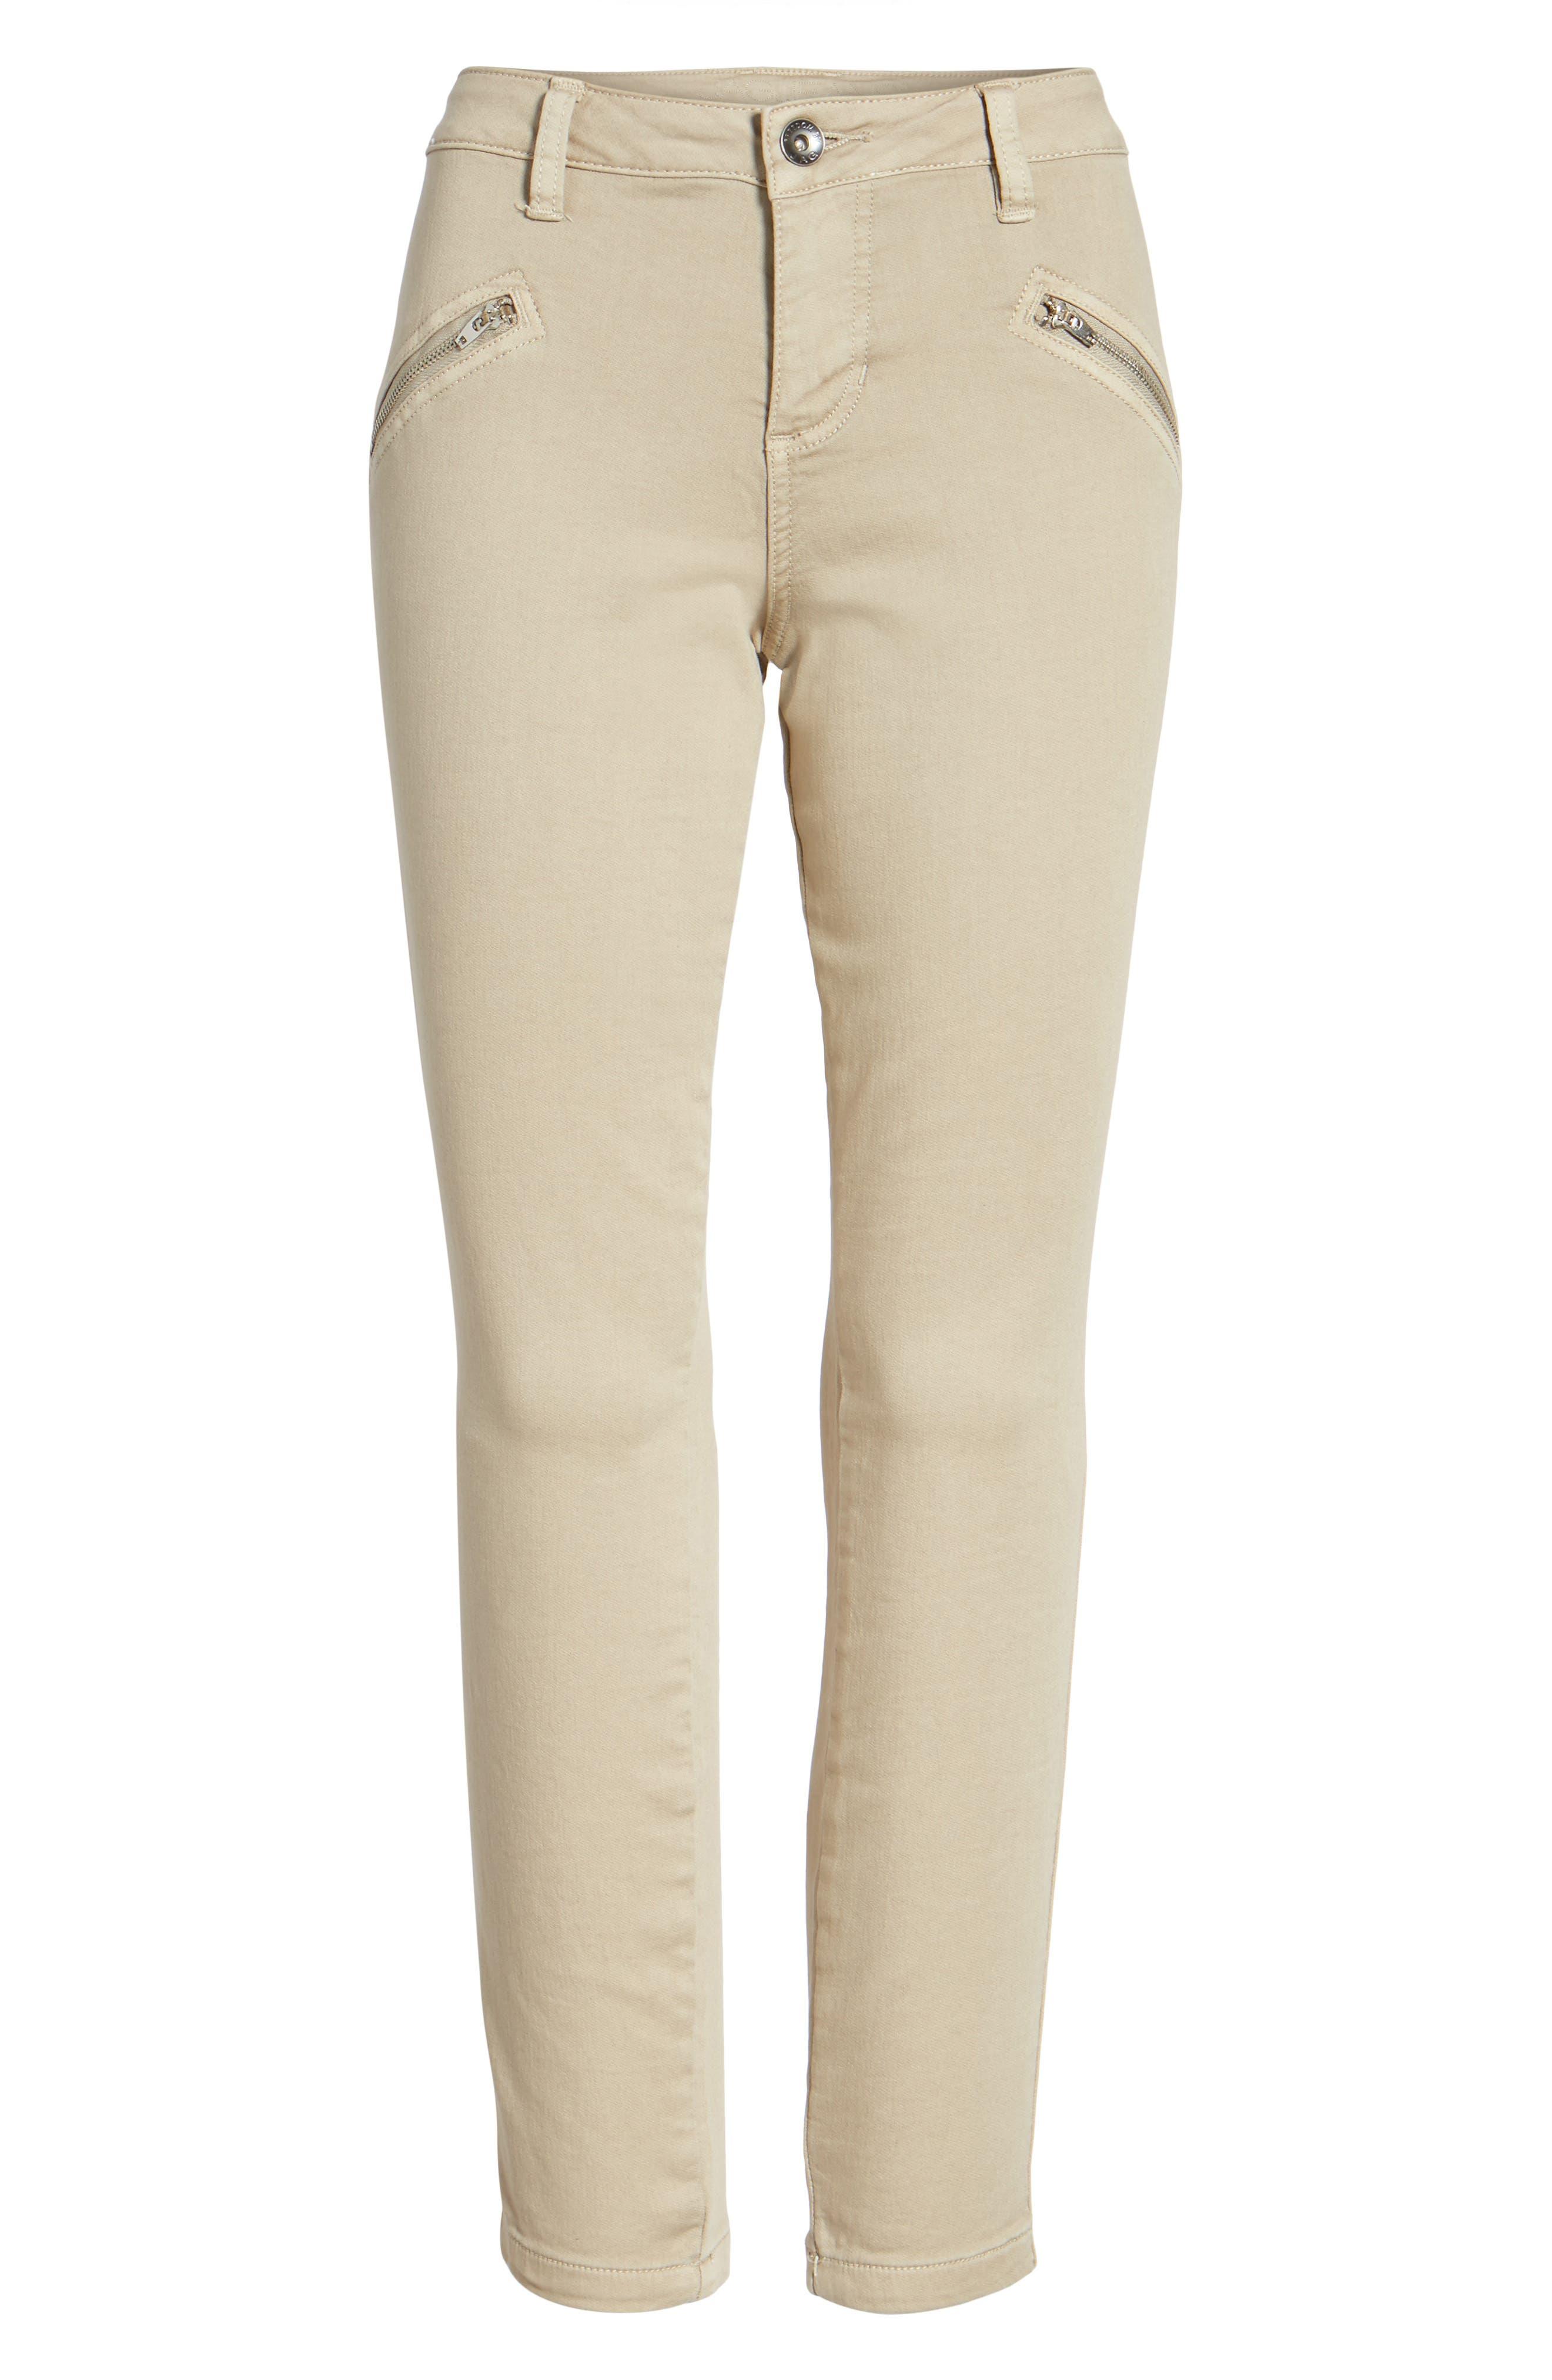 Ryan Knit Skinny Jeans,                             Alternate thumbnail 6, color,                             Birchwood